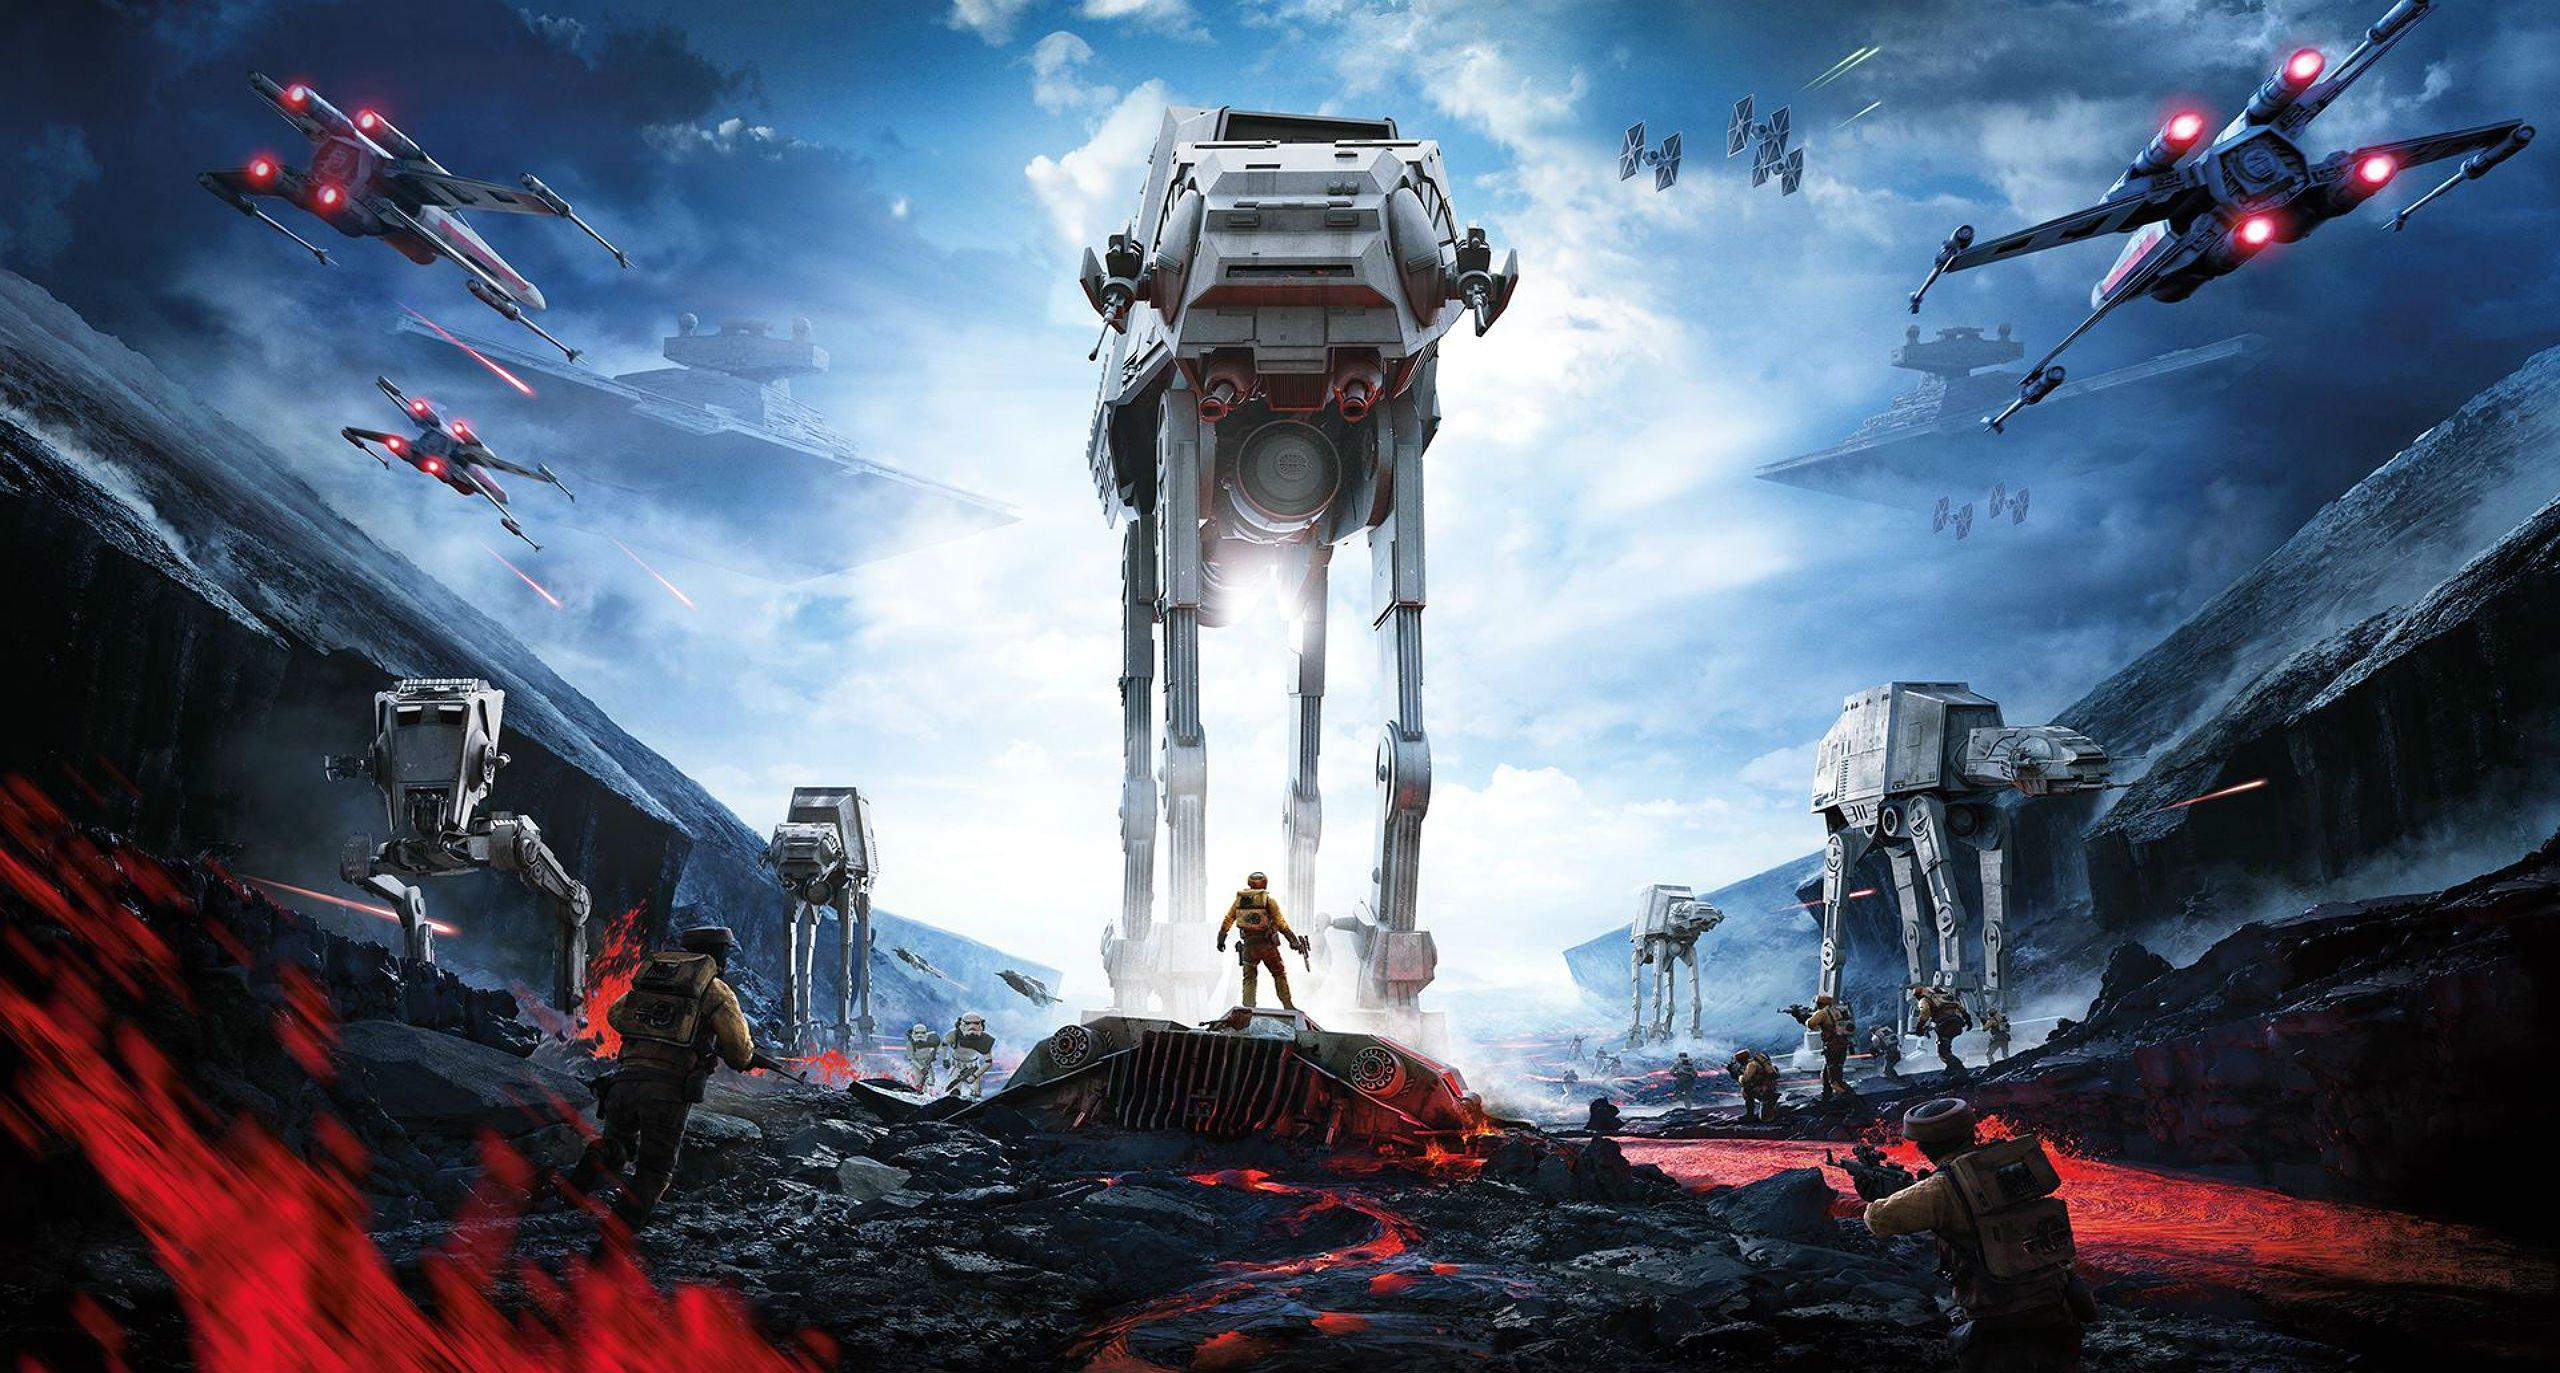 Star Wars Battlefront Wallpaper HD - WallpaperSafari